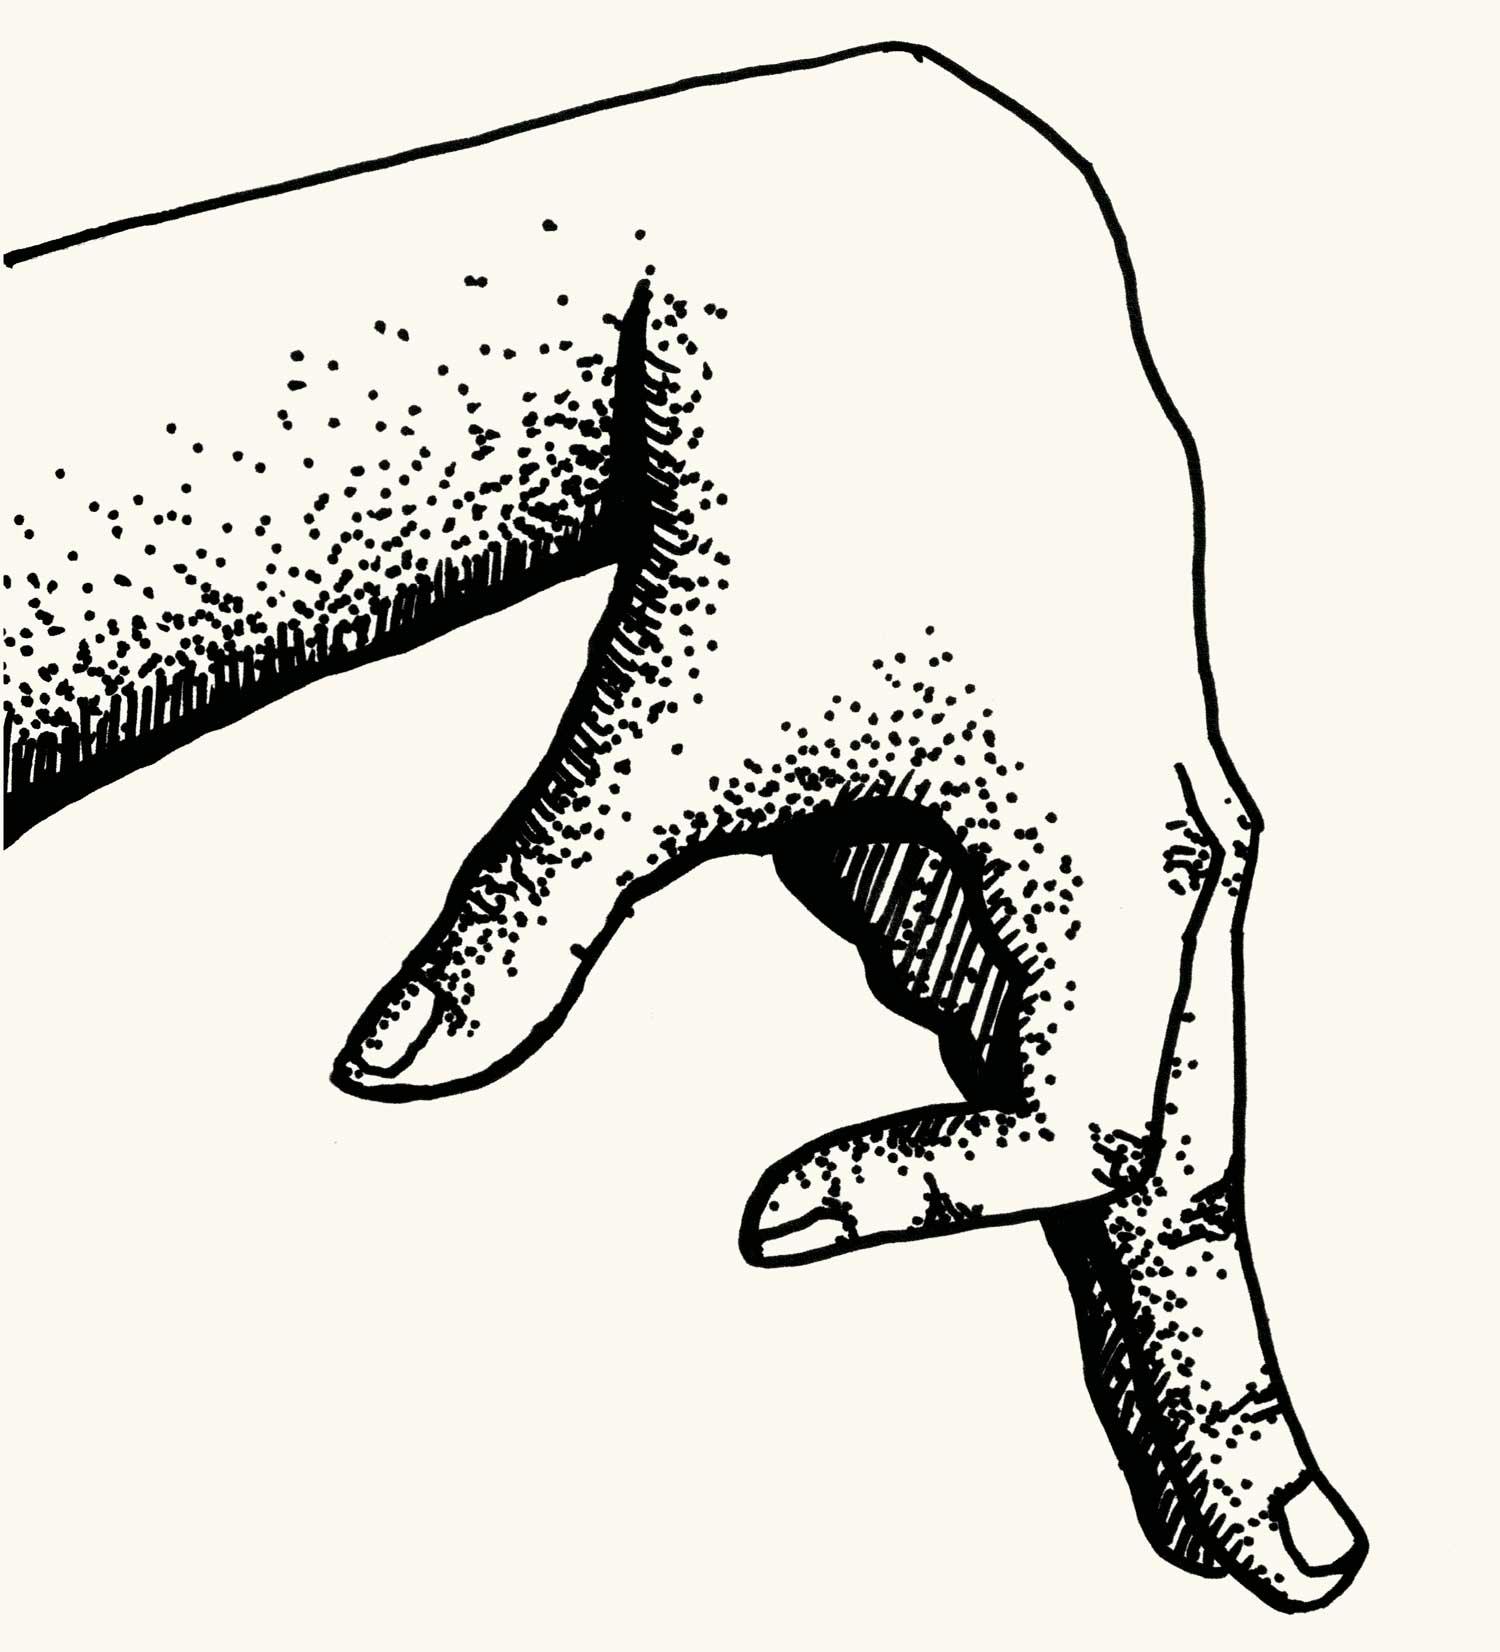 Common gang symbols image collections symbol and sign ideas california gang hand symbols buycottarizona biocorpaavc